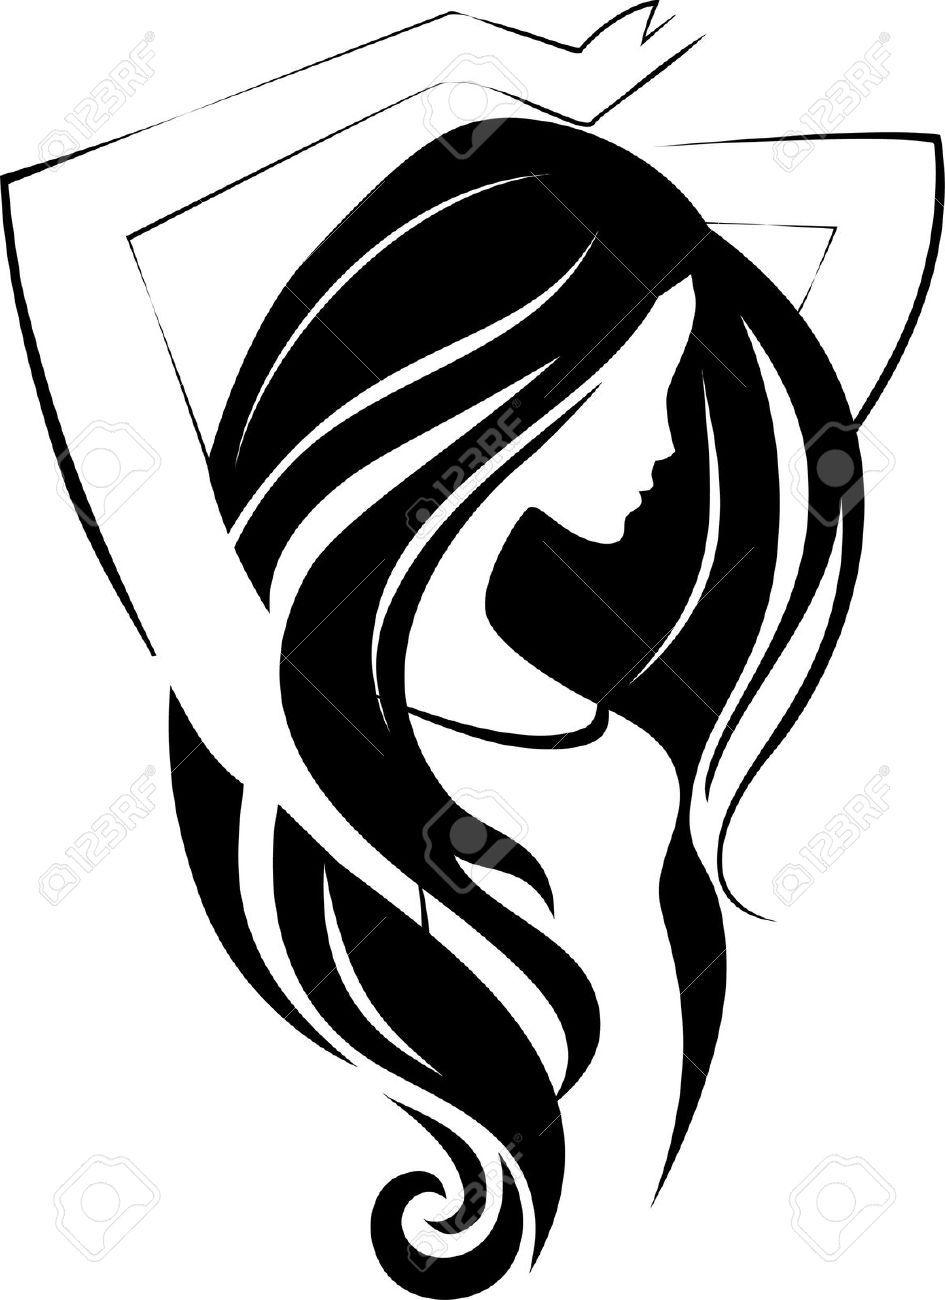 woman silhouette - google